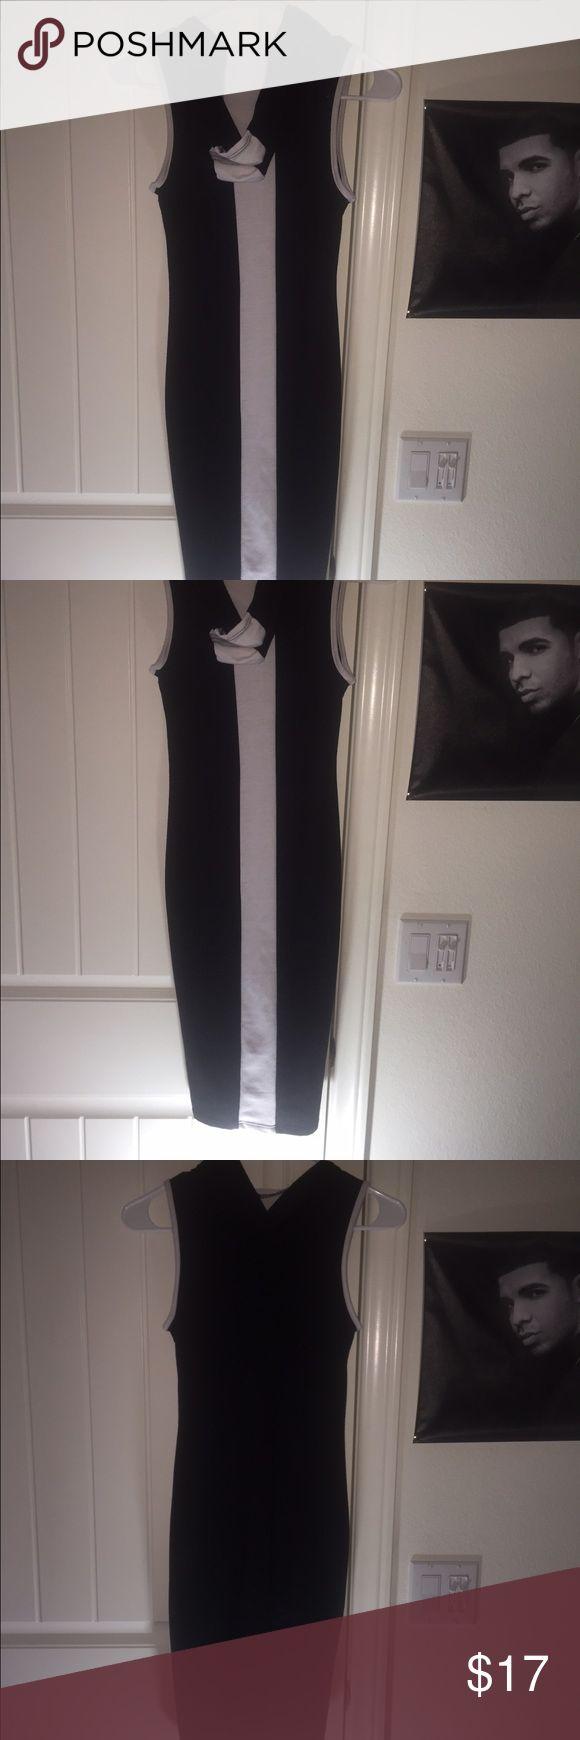 Black dress Skin tight black dress with a hood on the back Forever 21 Dresses Mini